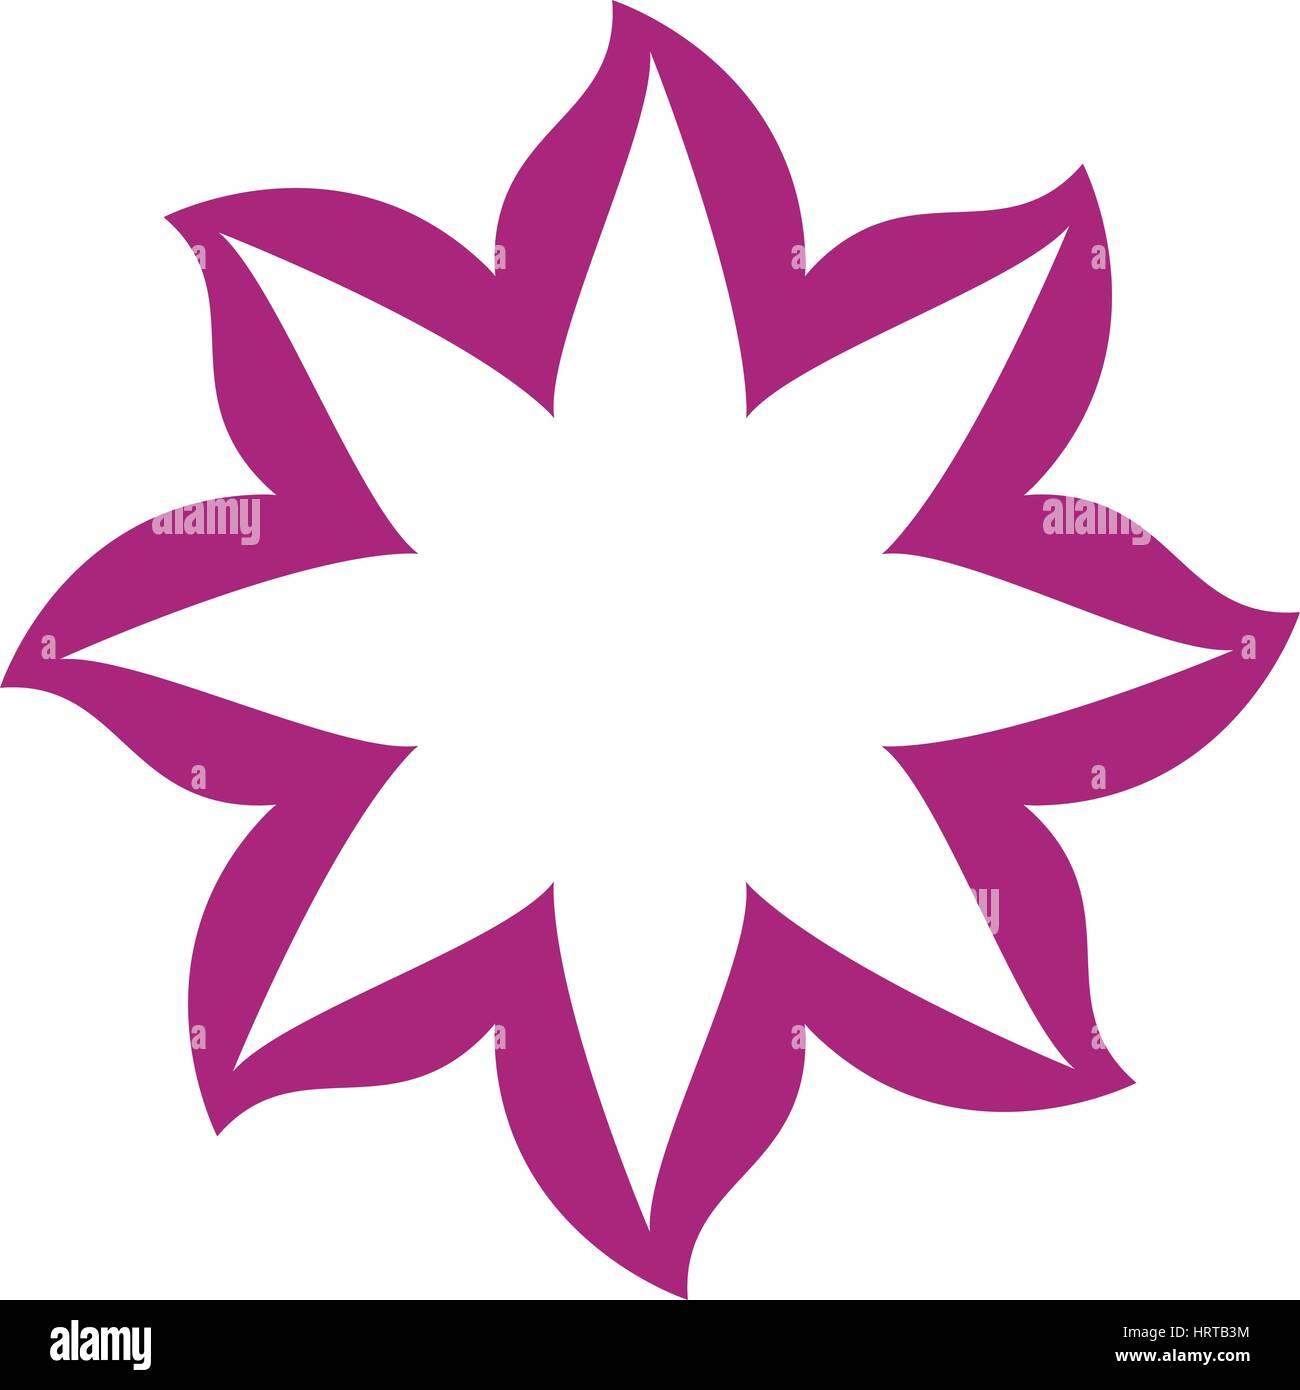 thin contour magenta of flower icon - Stock Image